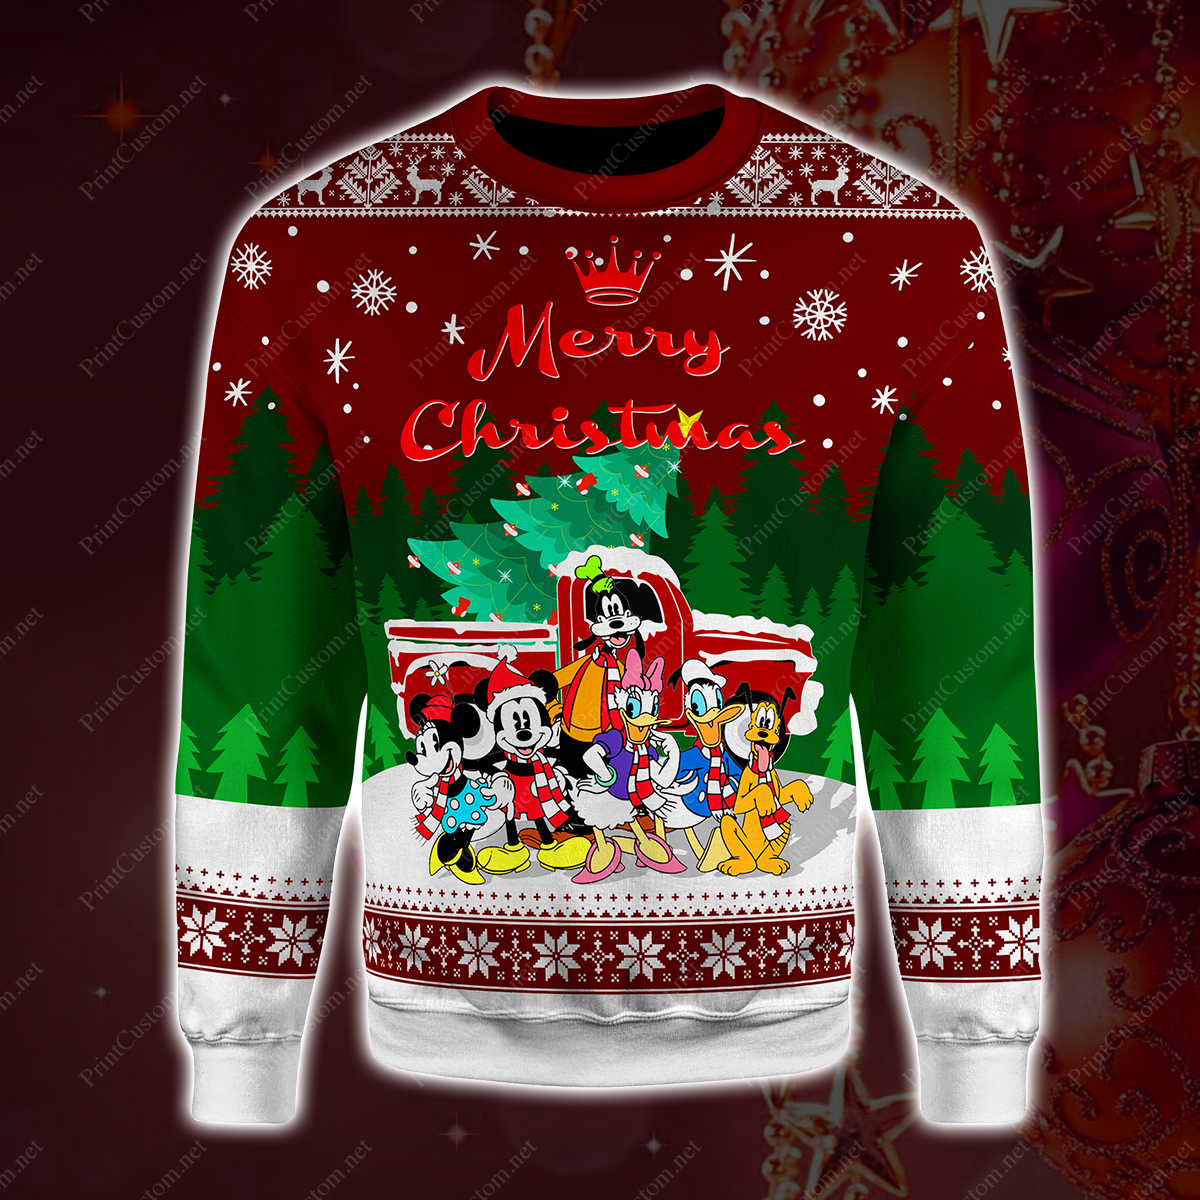 Disney characters merry christmas full printing sweatshirt